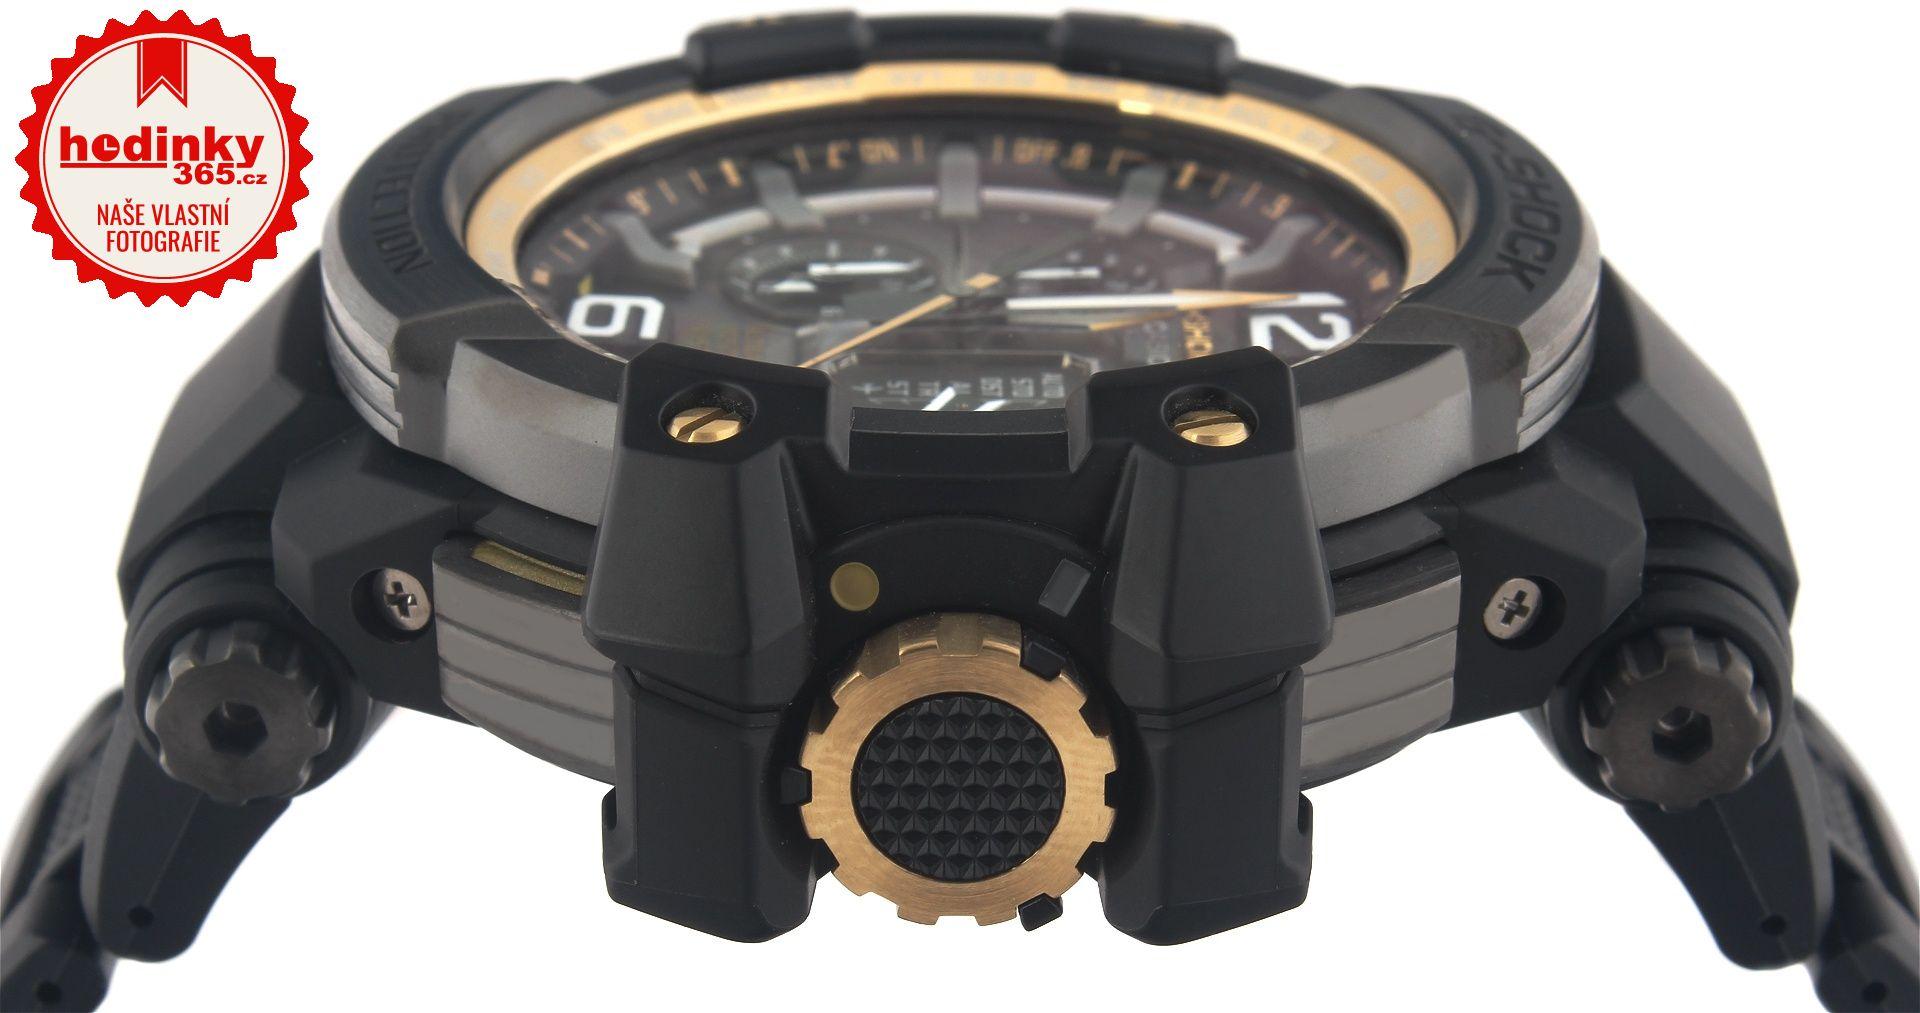 Casio G-Shock Gravitymaster GPW-1000FC-1A9ER